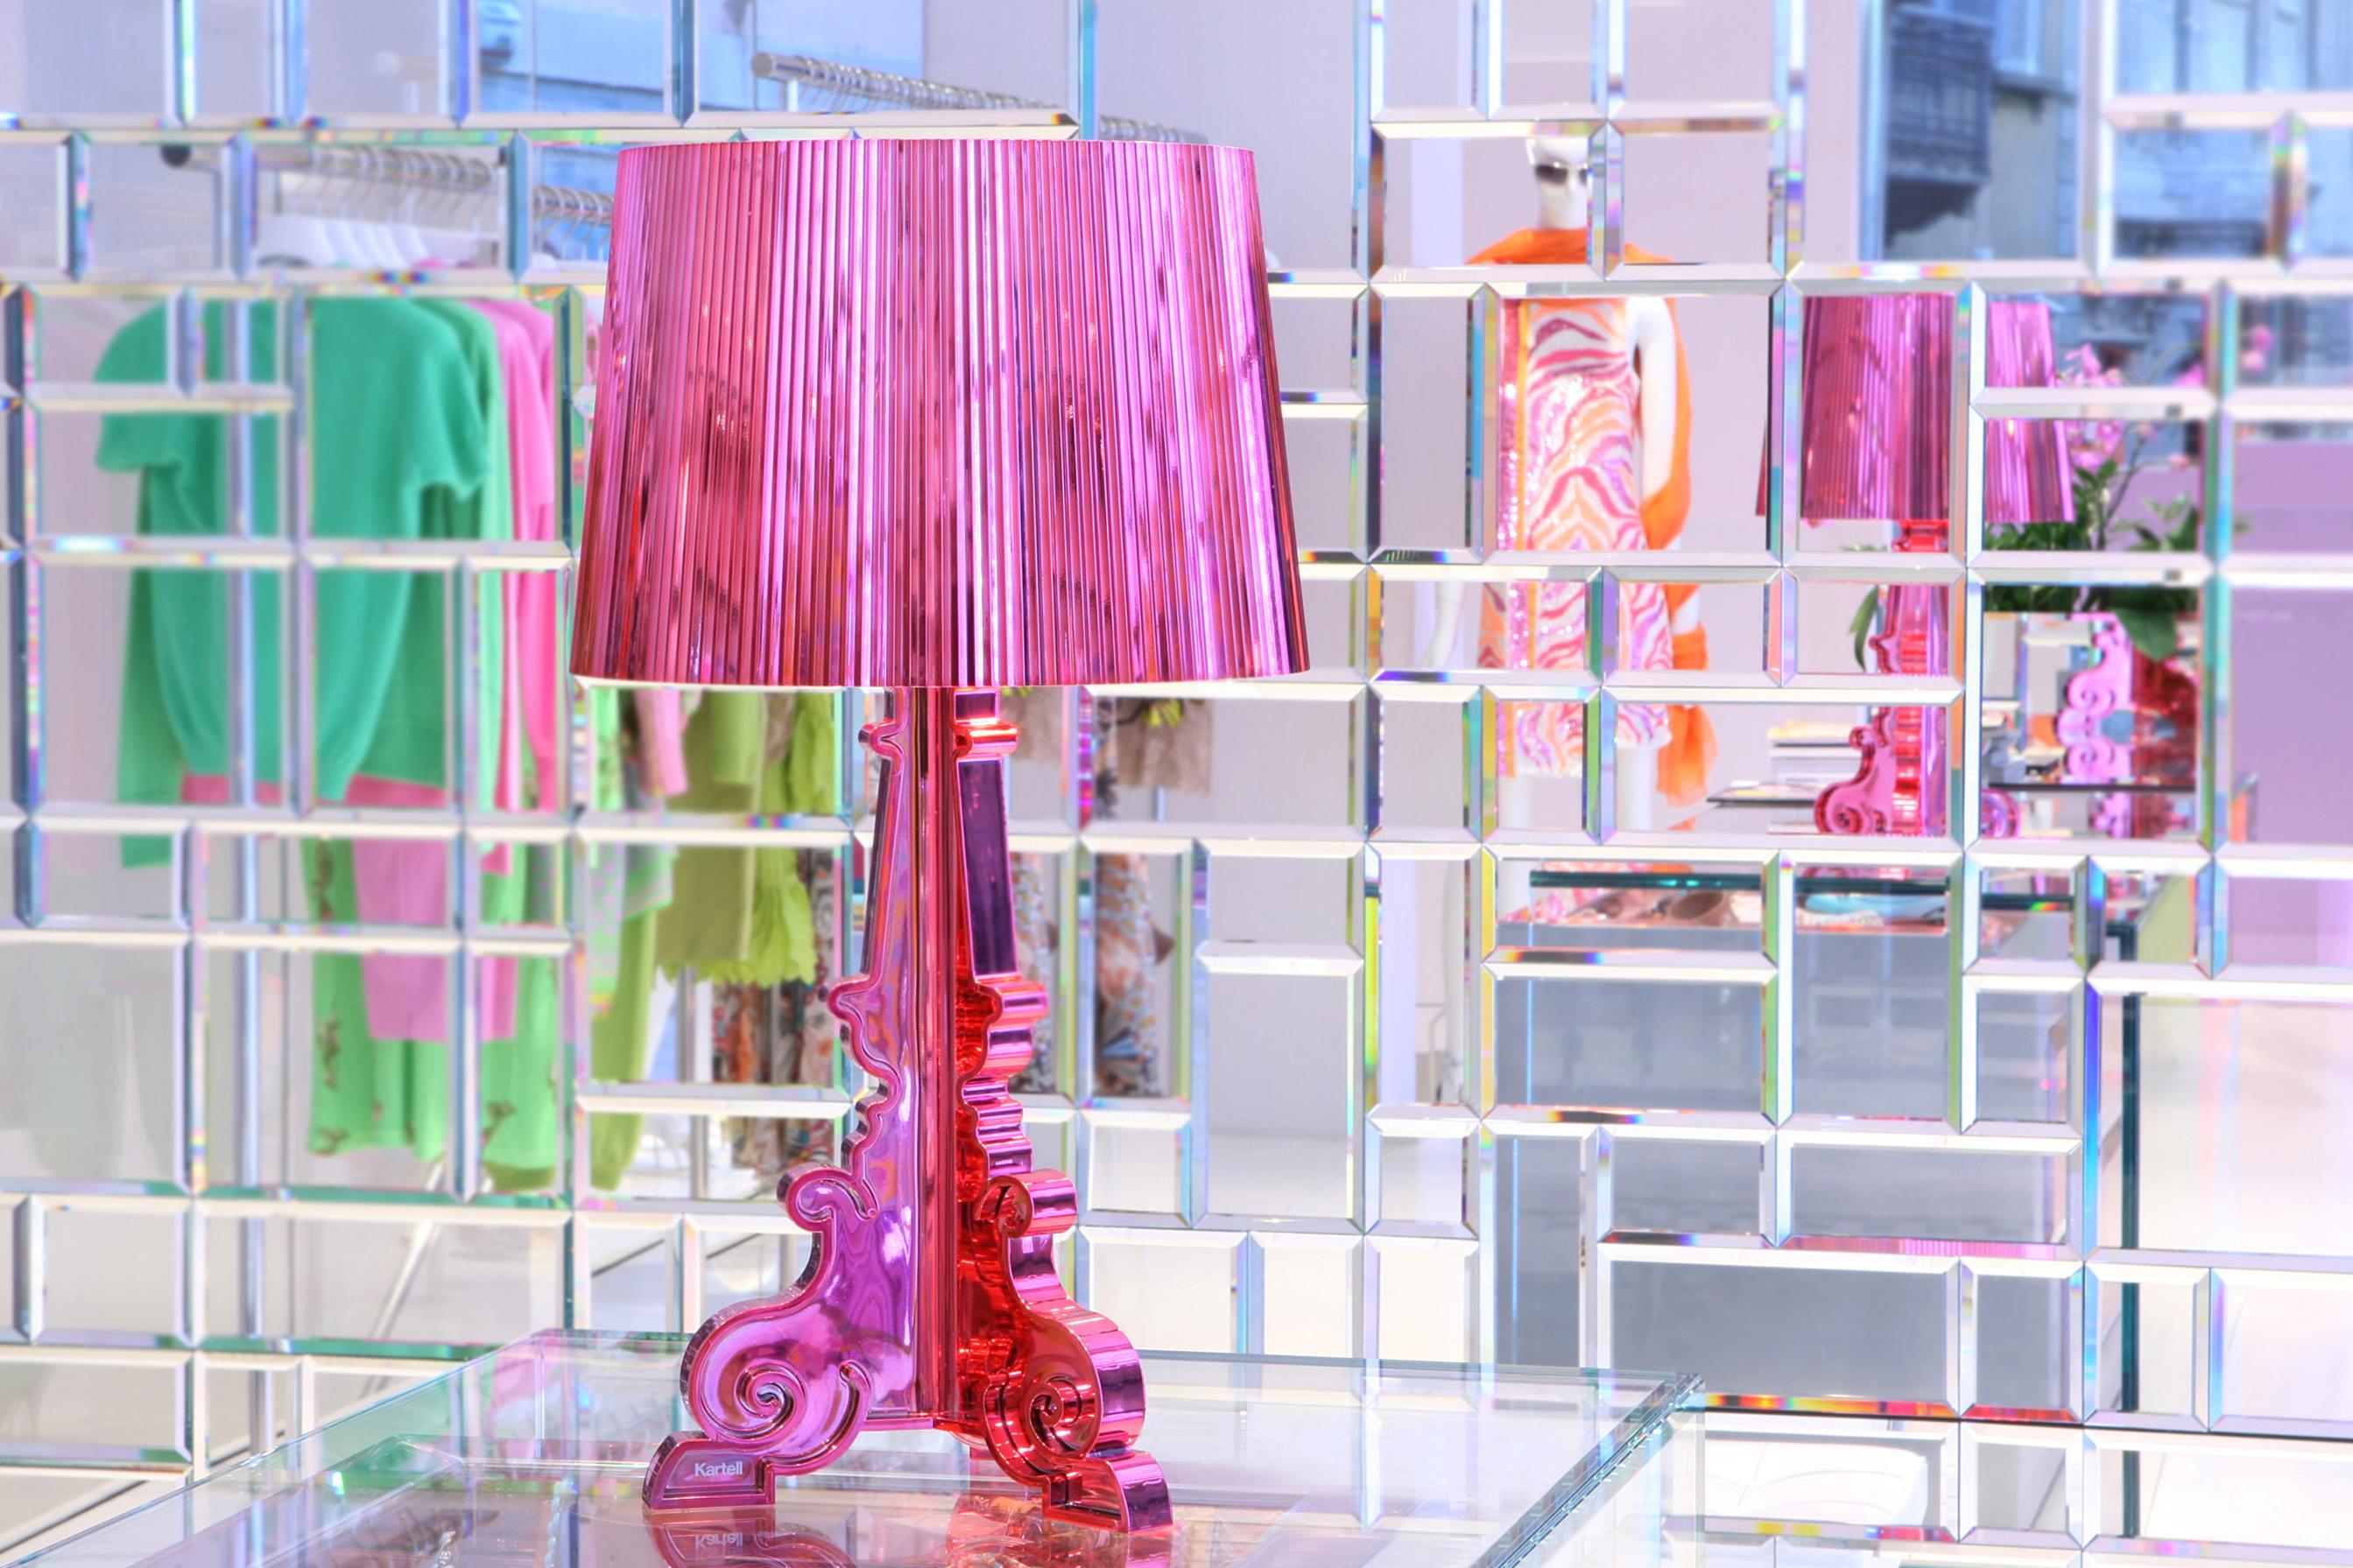 kartell lamps photo - 10